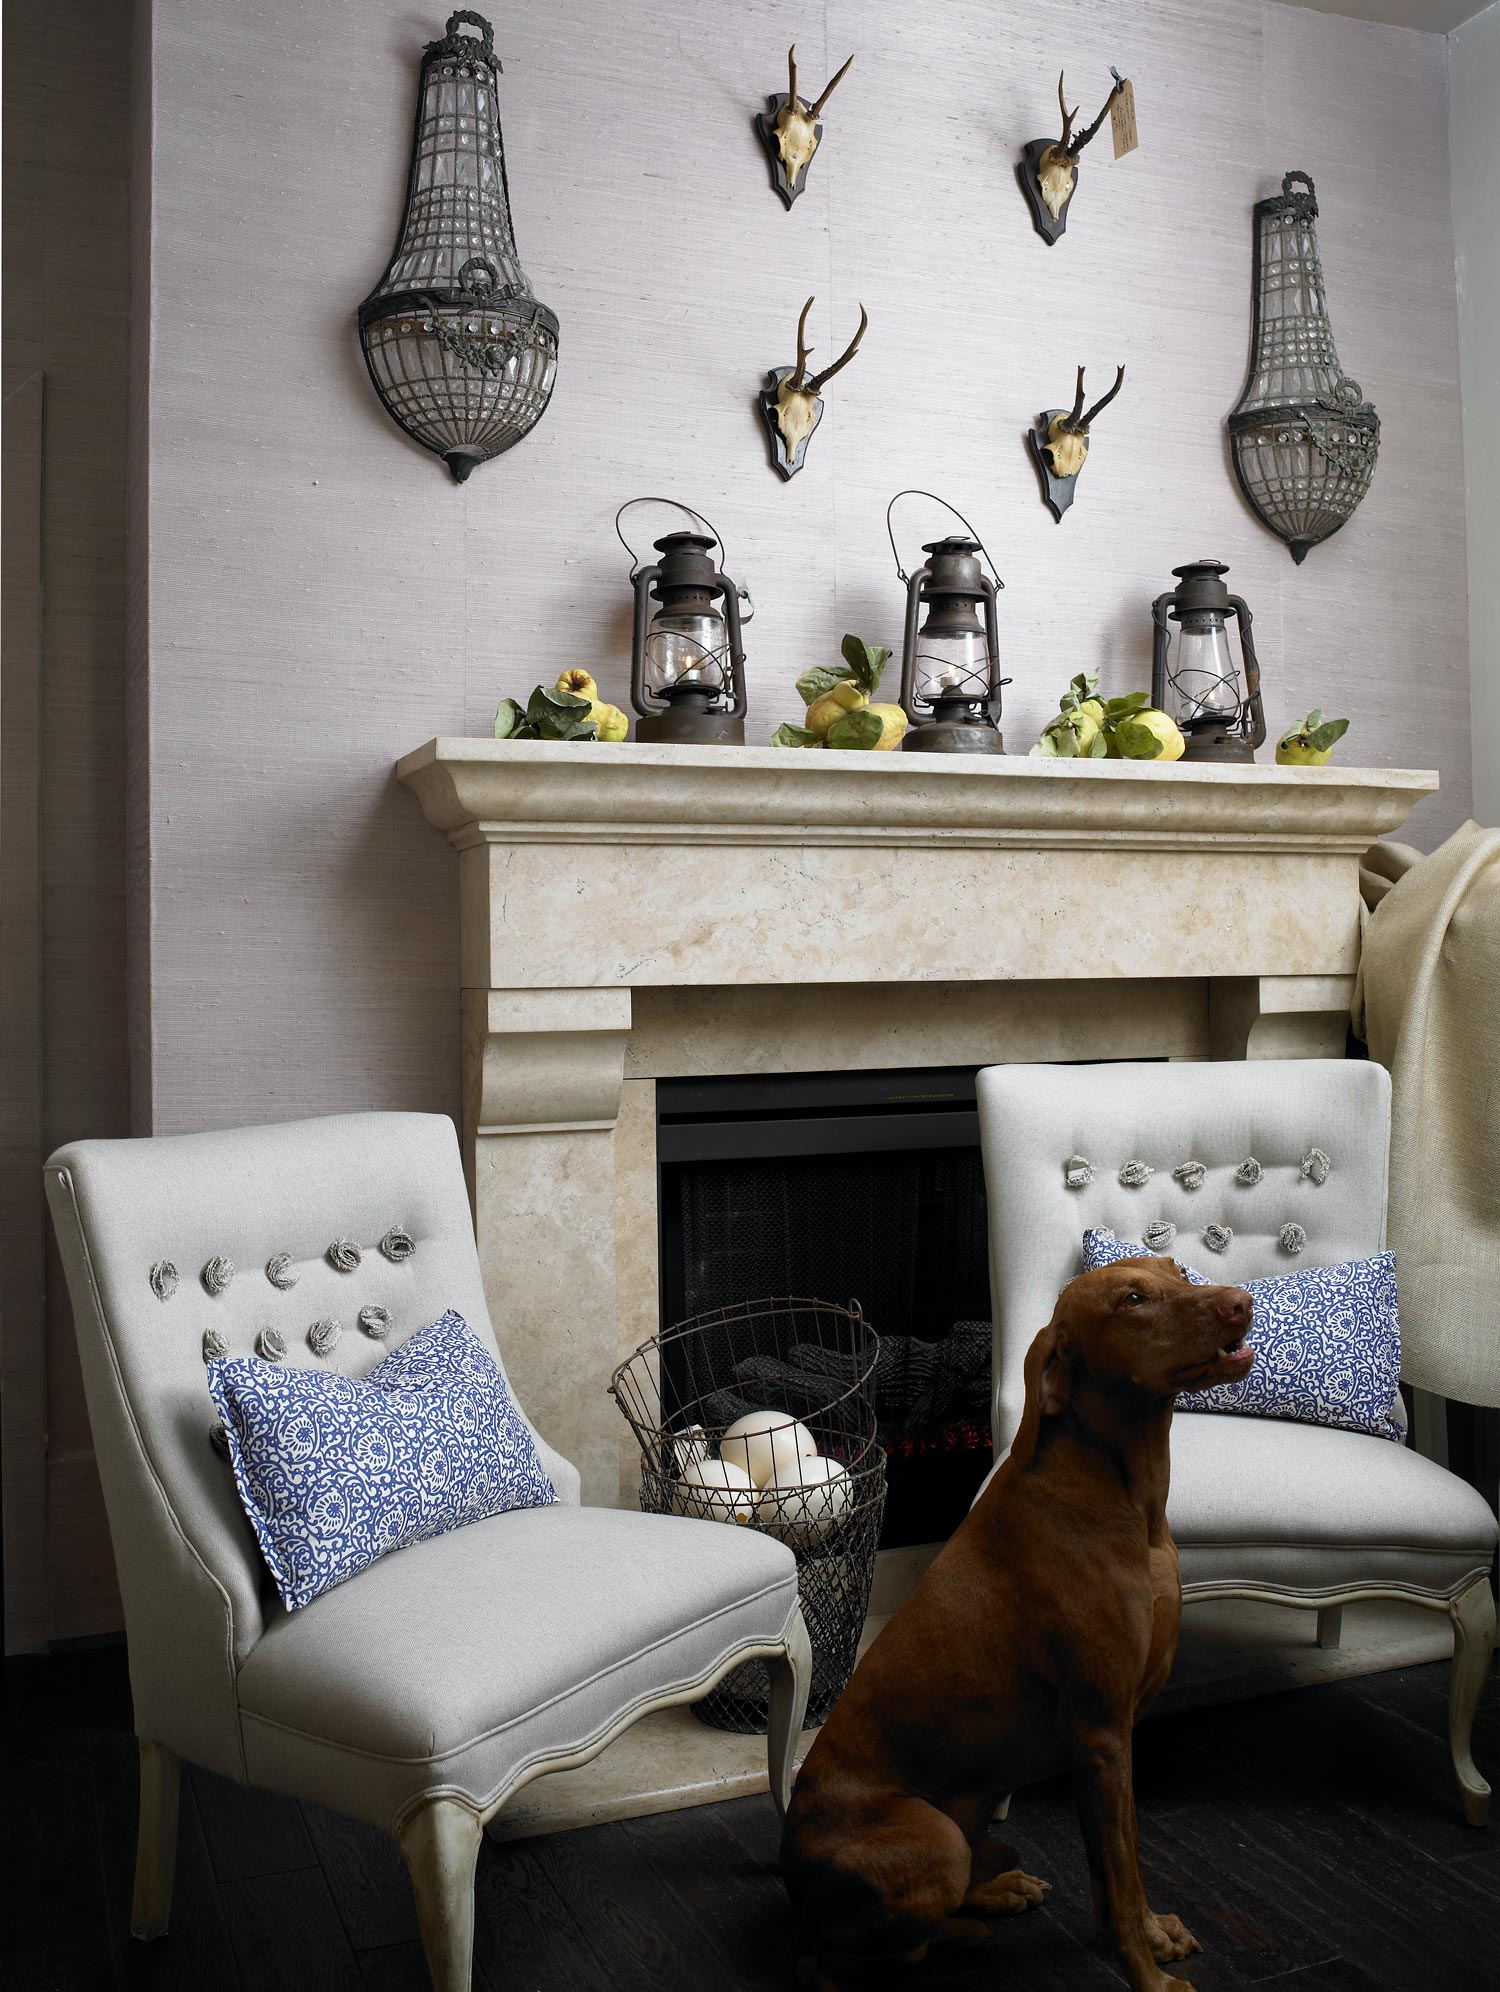 store-fireplace-sharp.jpg